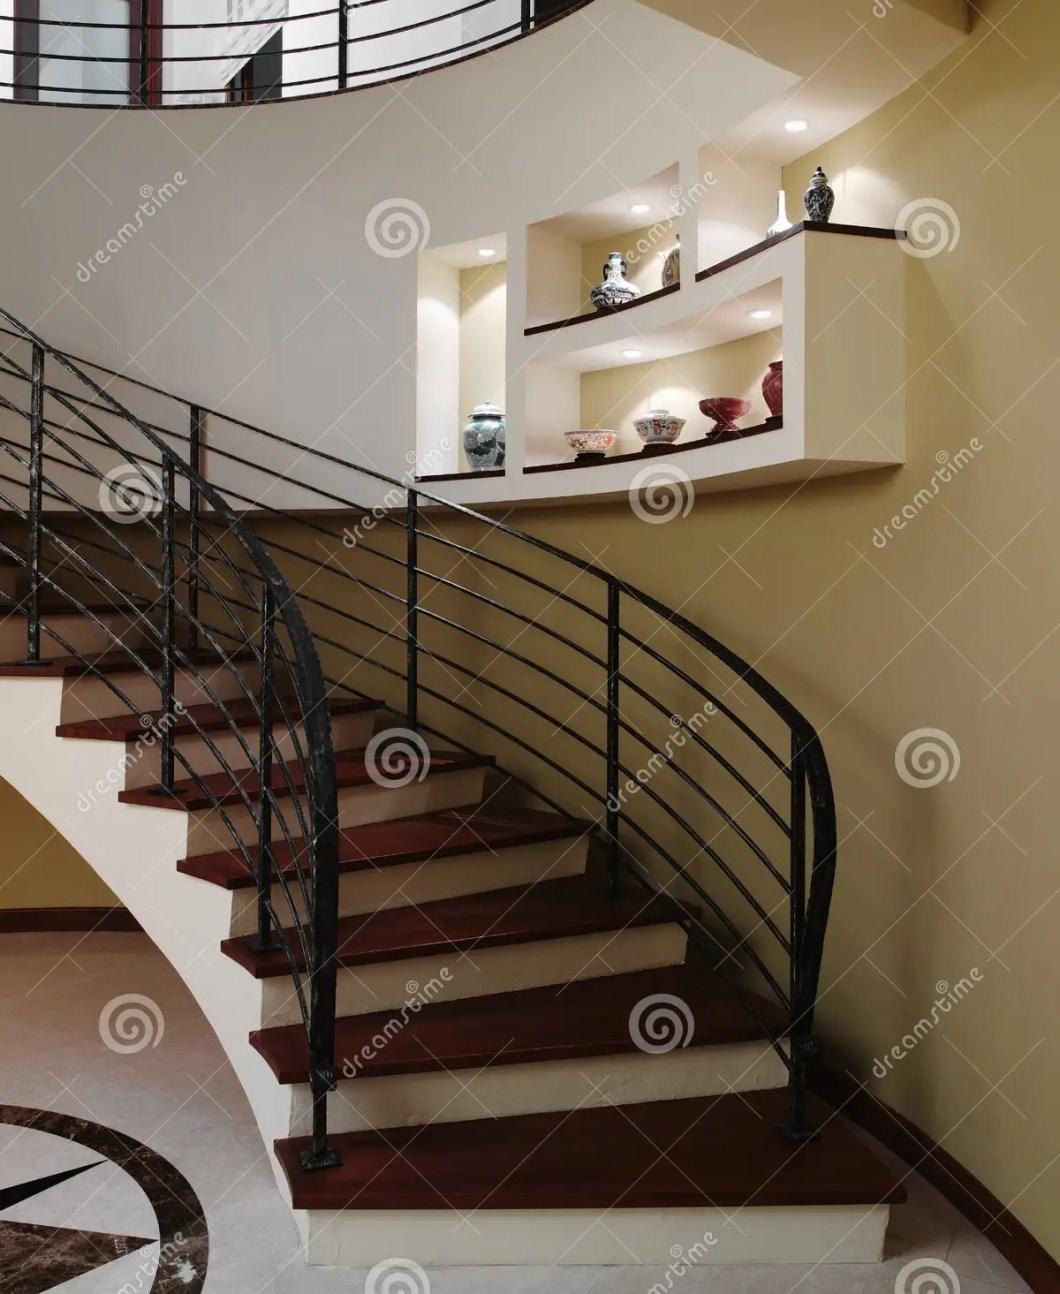 Interior Designs Stairs Location: Interior Stair Design Photos